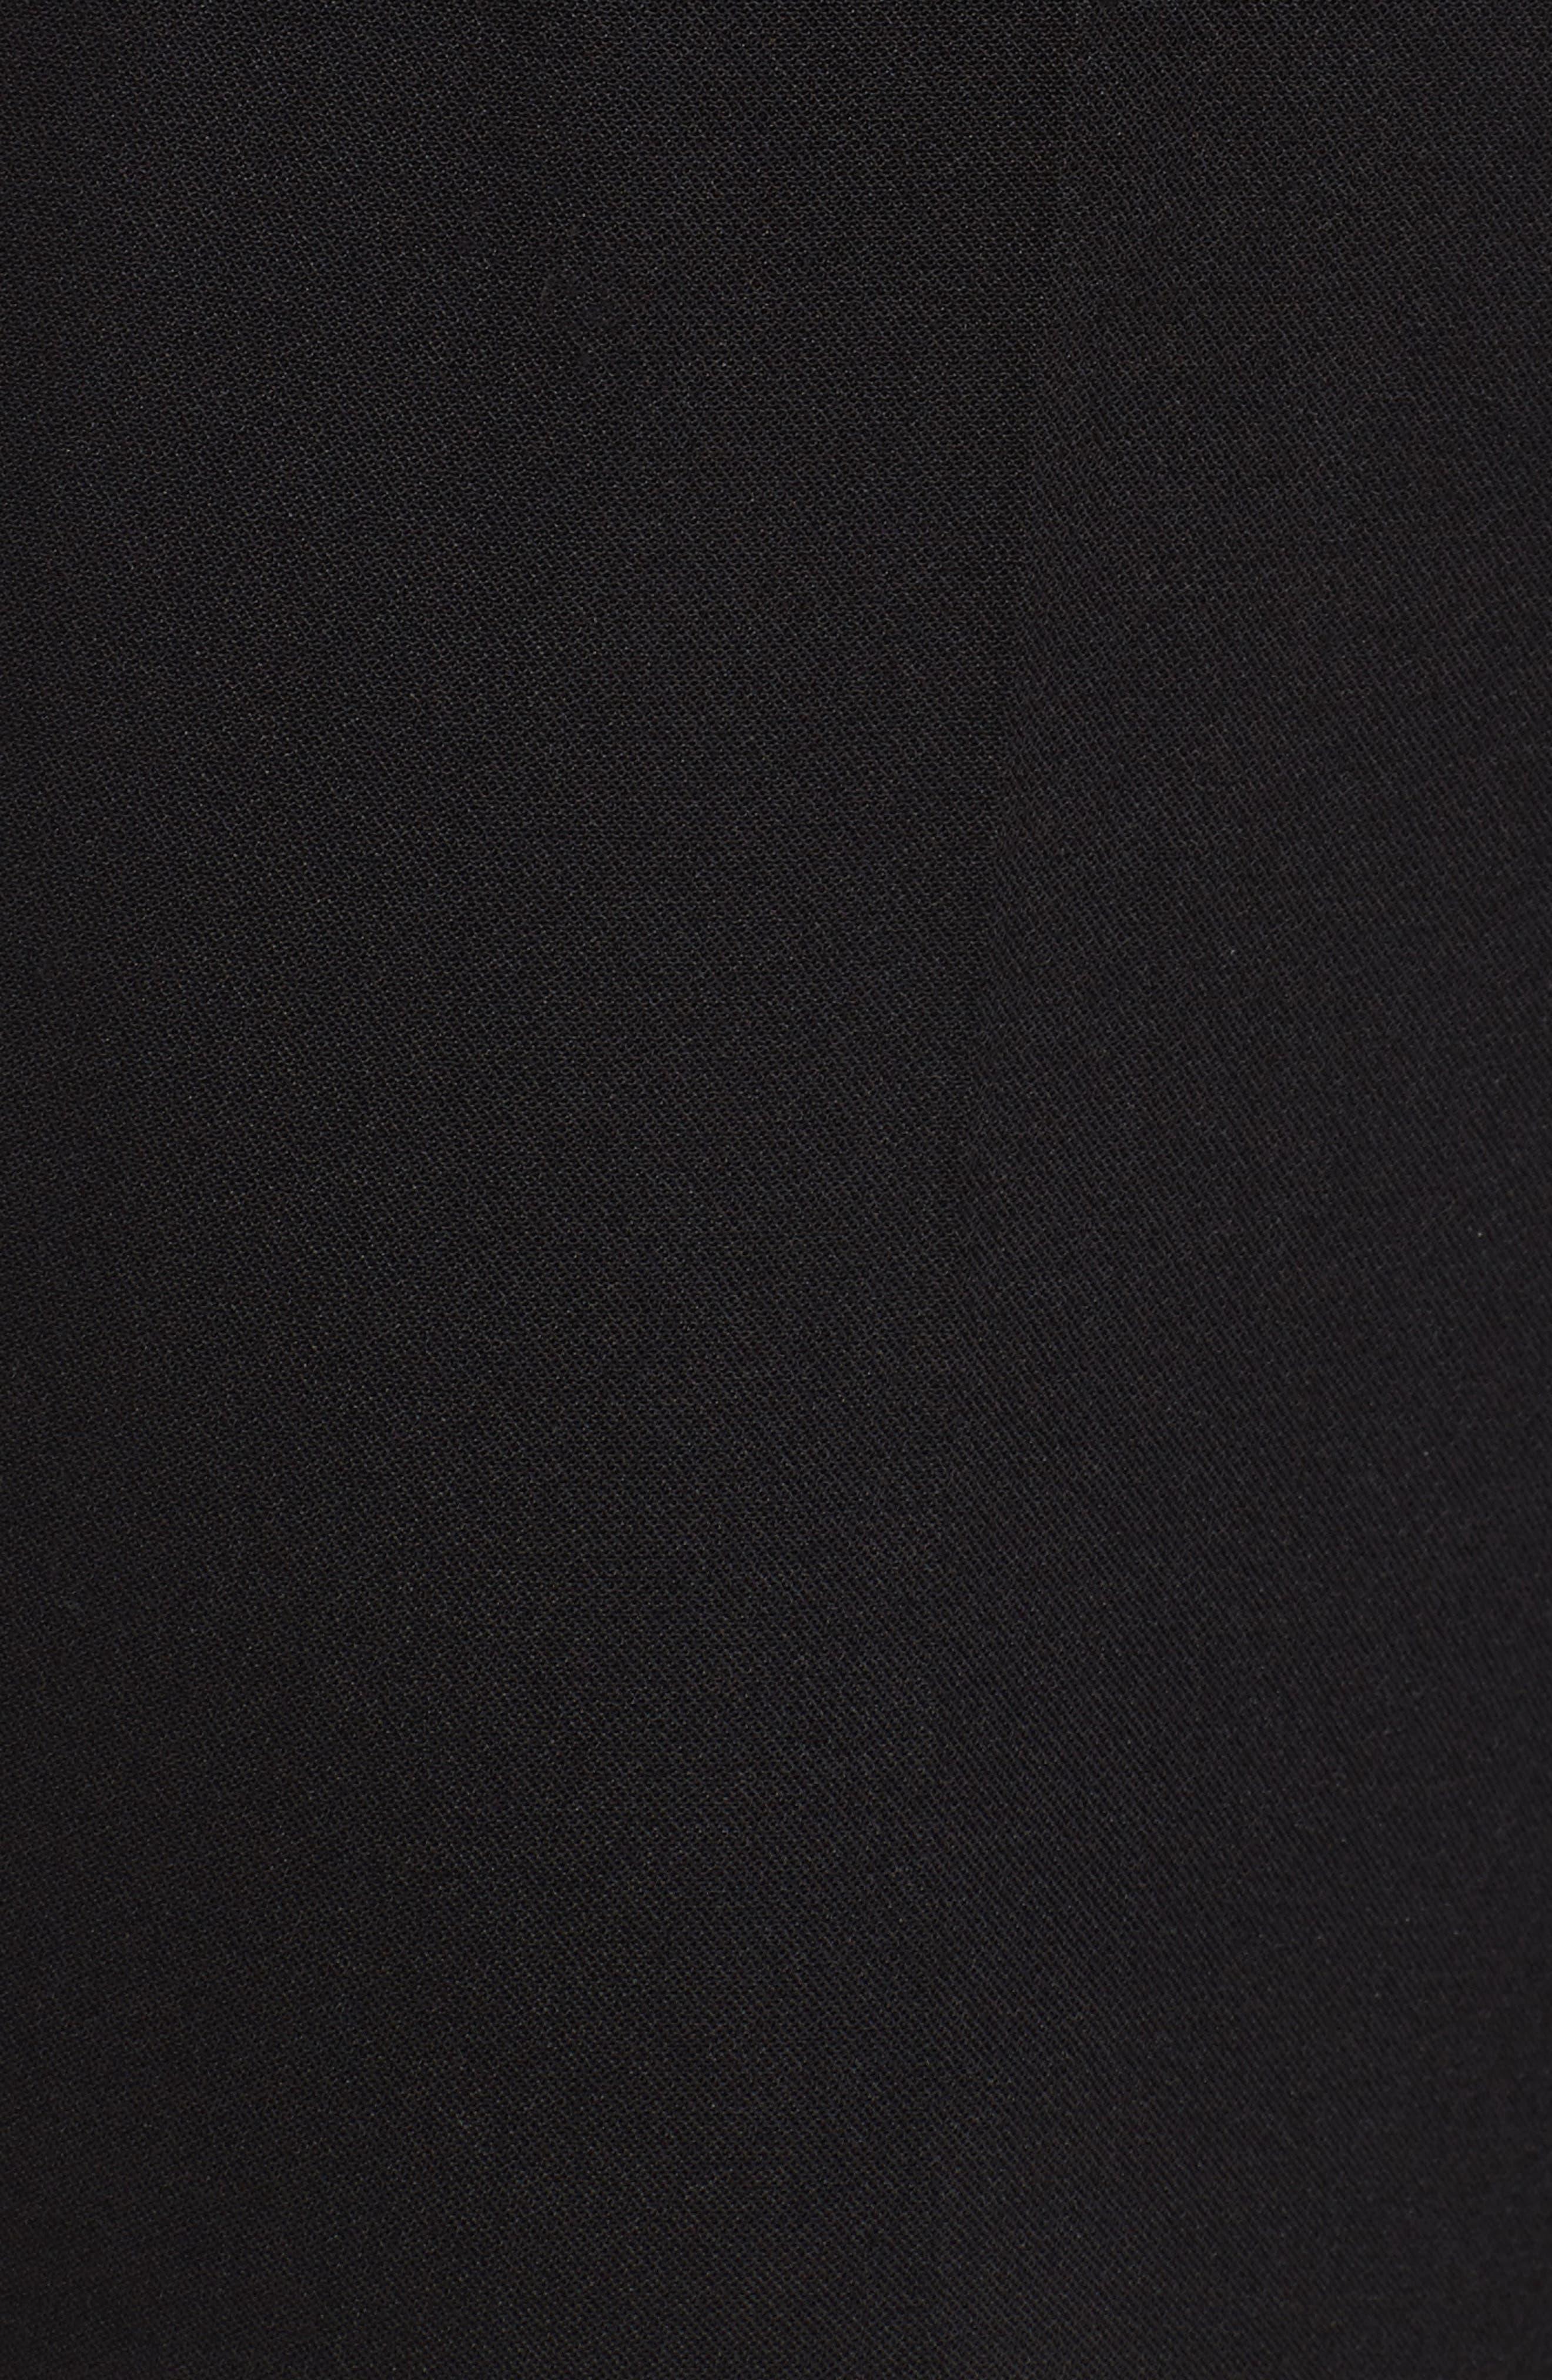 Soft Swing Pants,                             Alternate thumbnail 5, color,                             Black Onyx